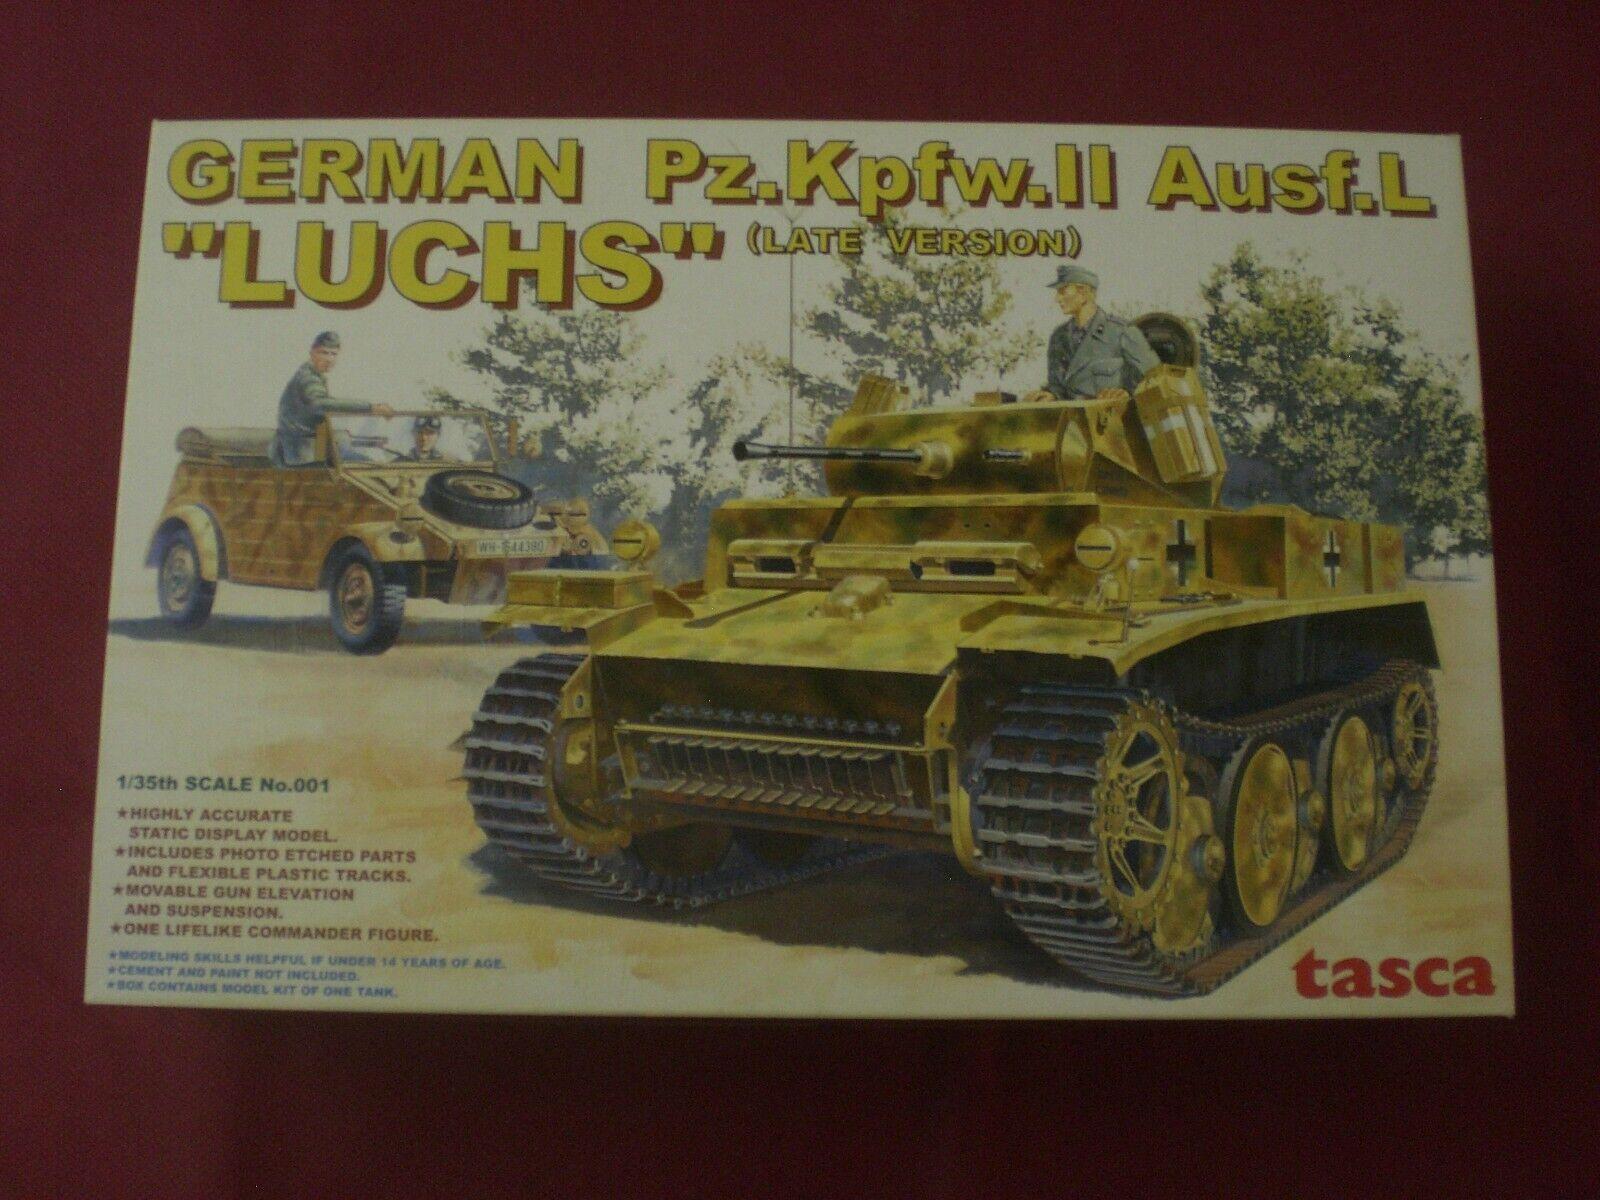 están haciendo actividades de descuento German Pz.Kpfw.II Ausf.L  Luchs  (Late Version) - SCALA SCALA SCALA 1 35 Tasca  compra limitada